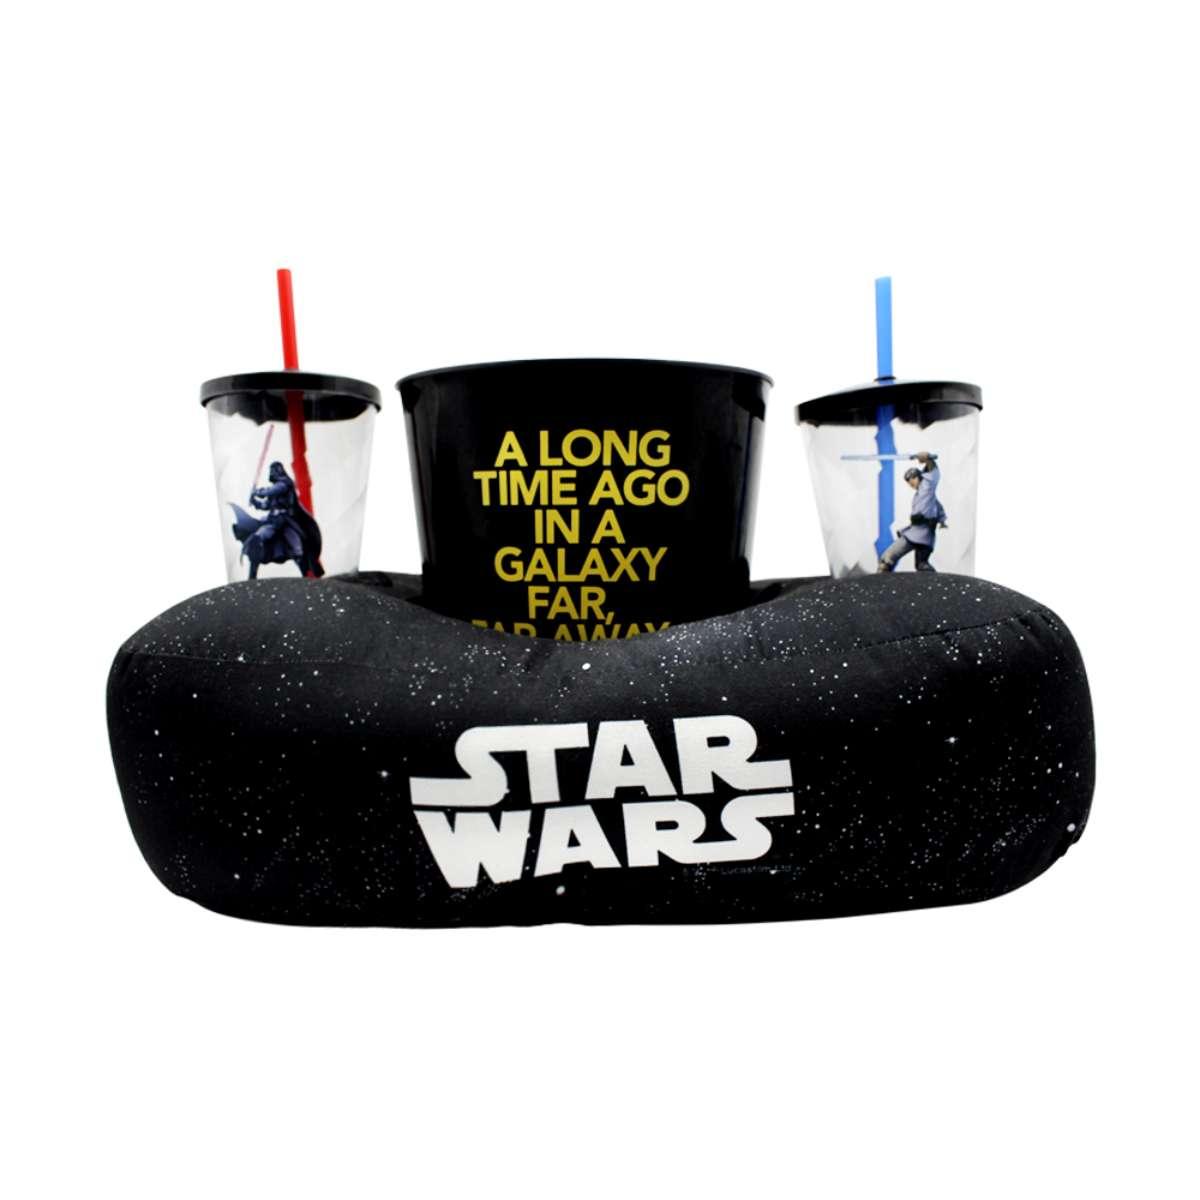 Kit Almofada Porta Pipoca Star Wars Galaxia